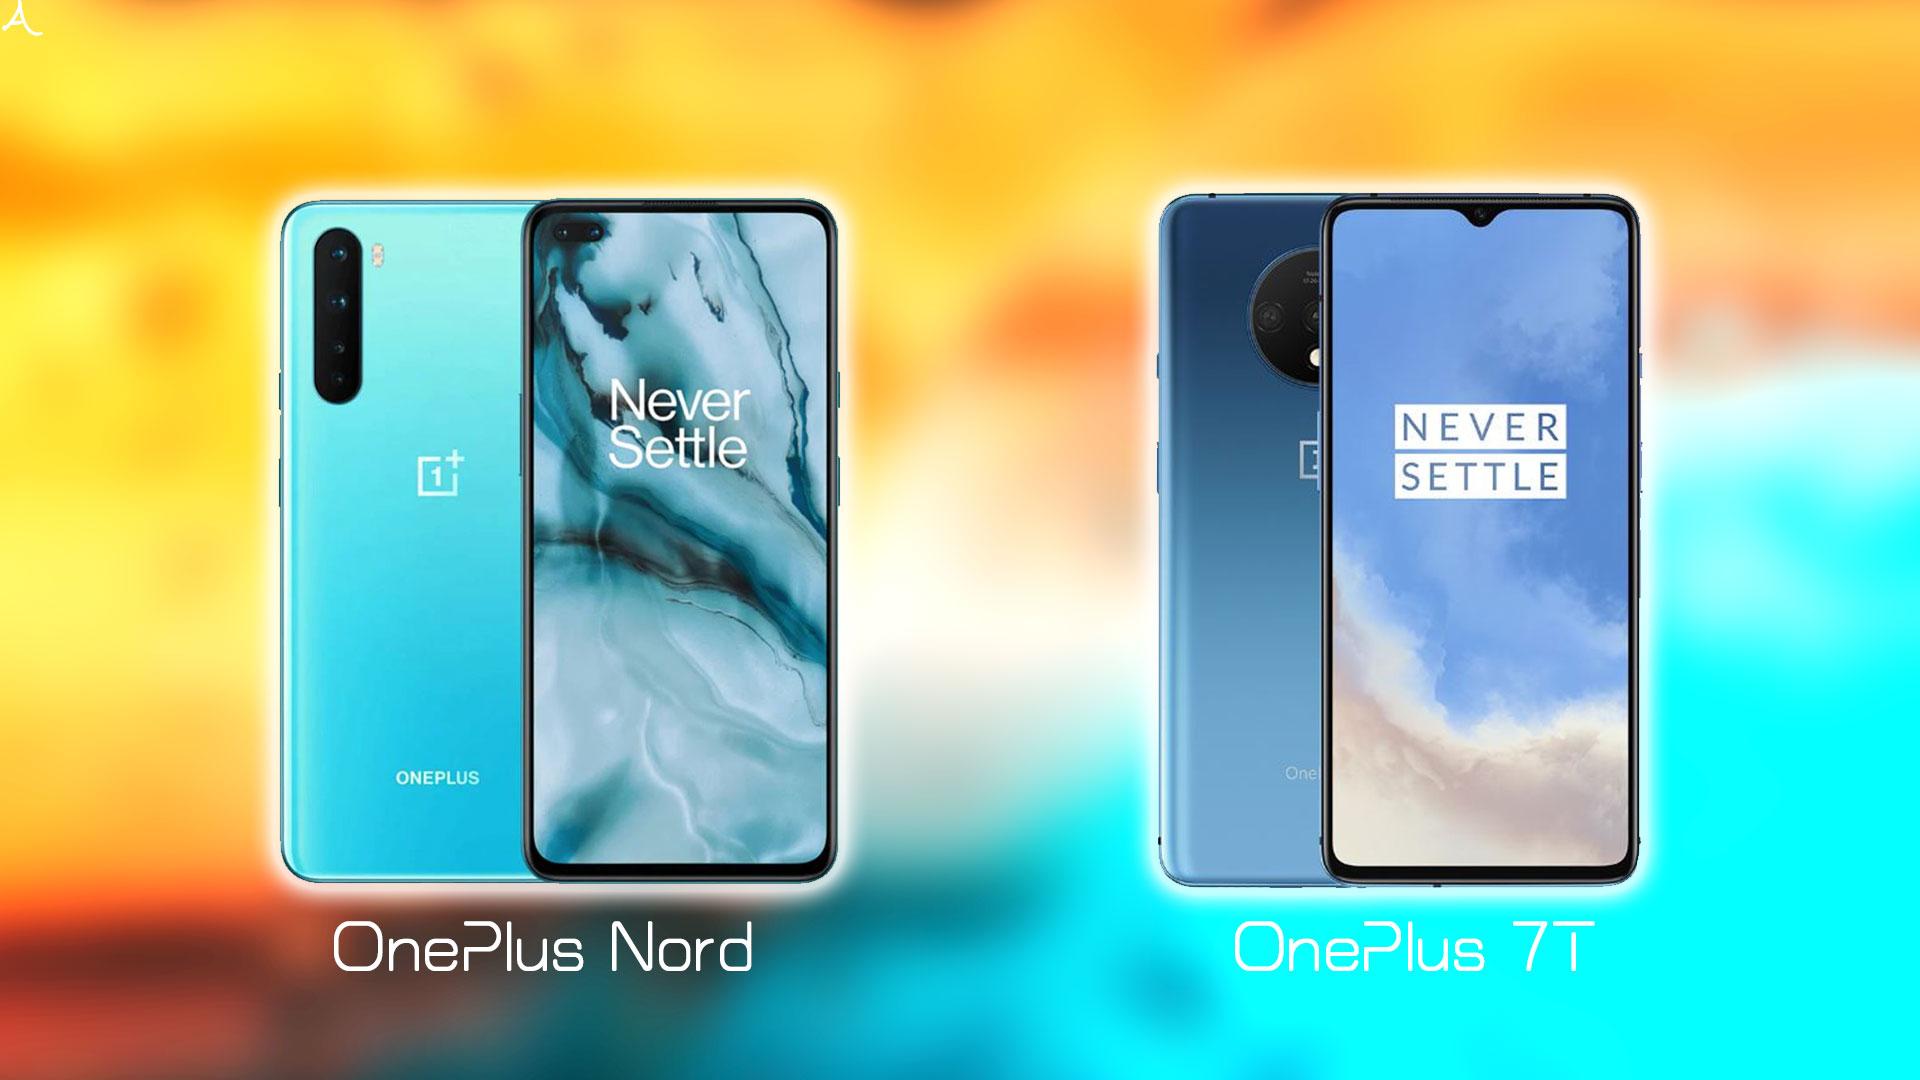 「OnePlus Nord」vs.「OnePlus 7T」: 日本で買うならどっち?スペックや違いを比較